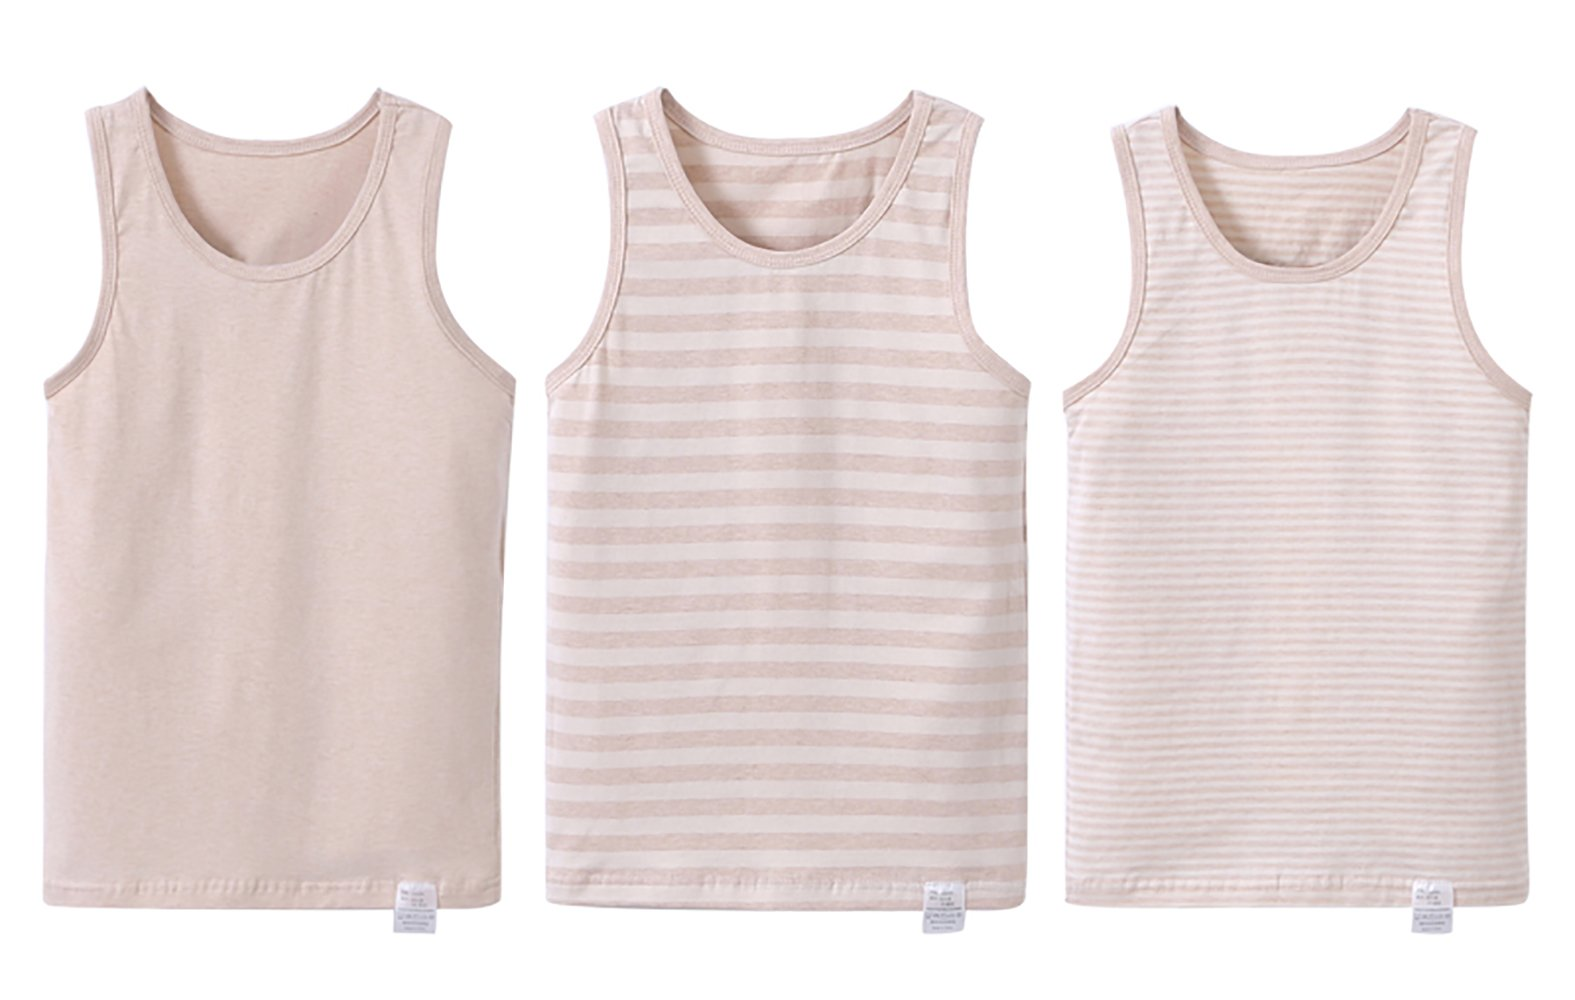 Zegoo Girls' Fine Jersey Tank Top Brown Printing (3/Pack)